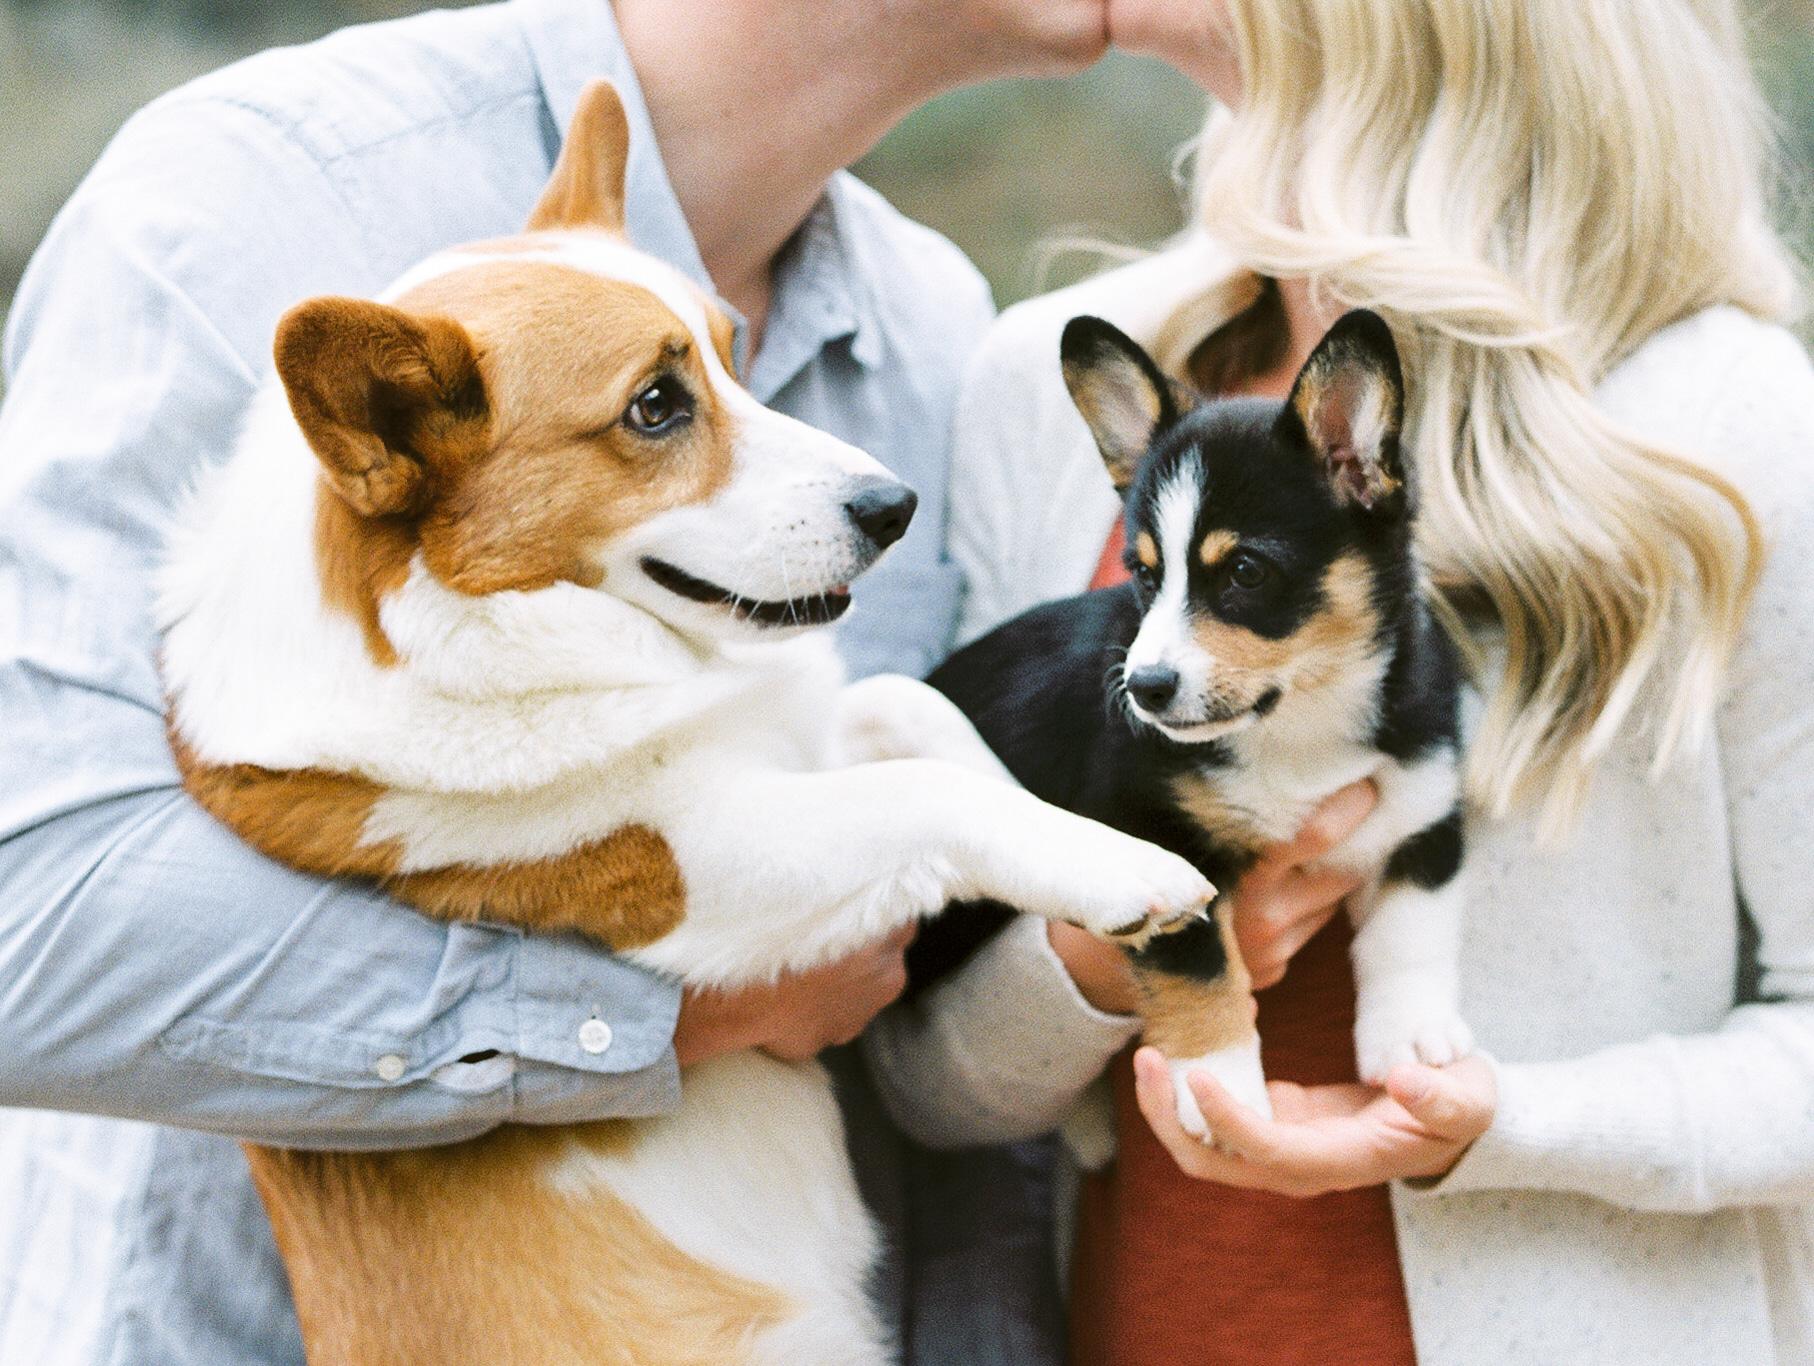 Atlanta-park-family-session-with-puppies-hannah-forsberg-atlanta-wedding-photographer129.JPG